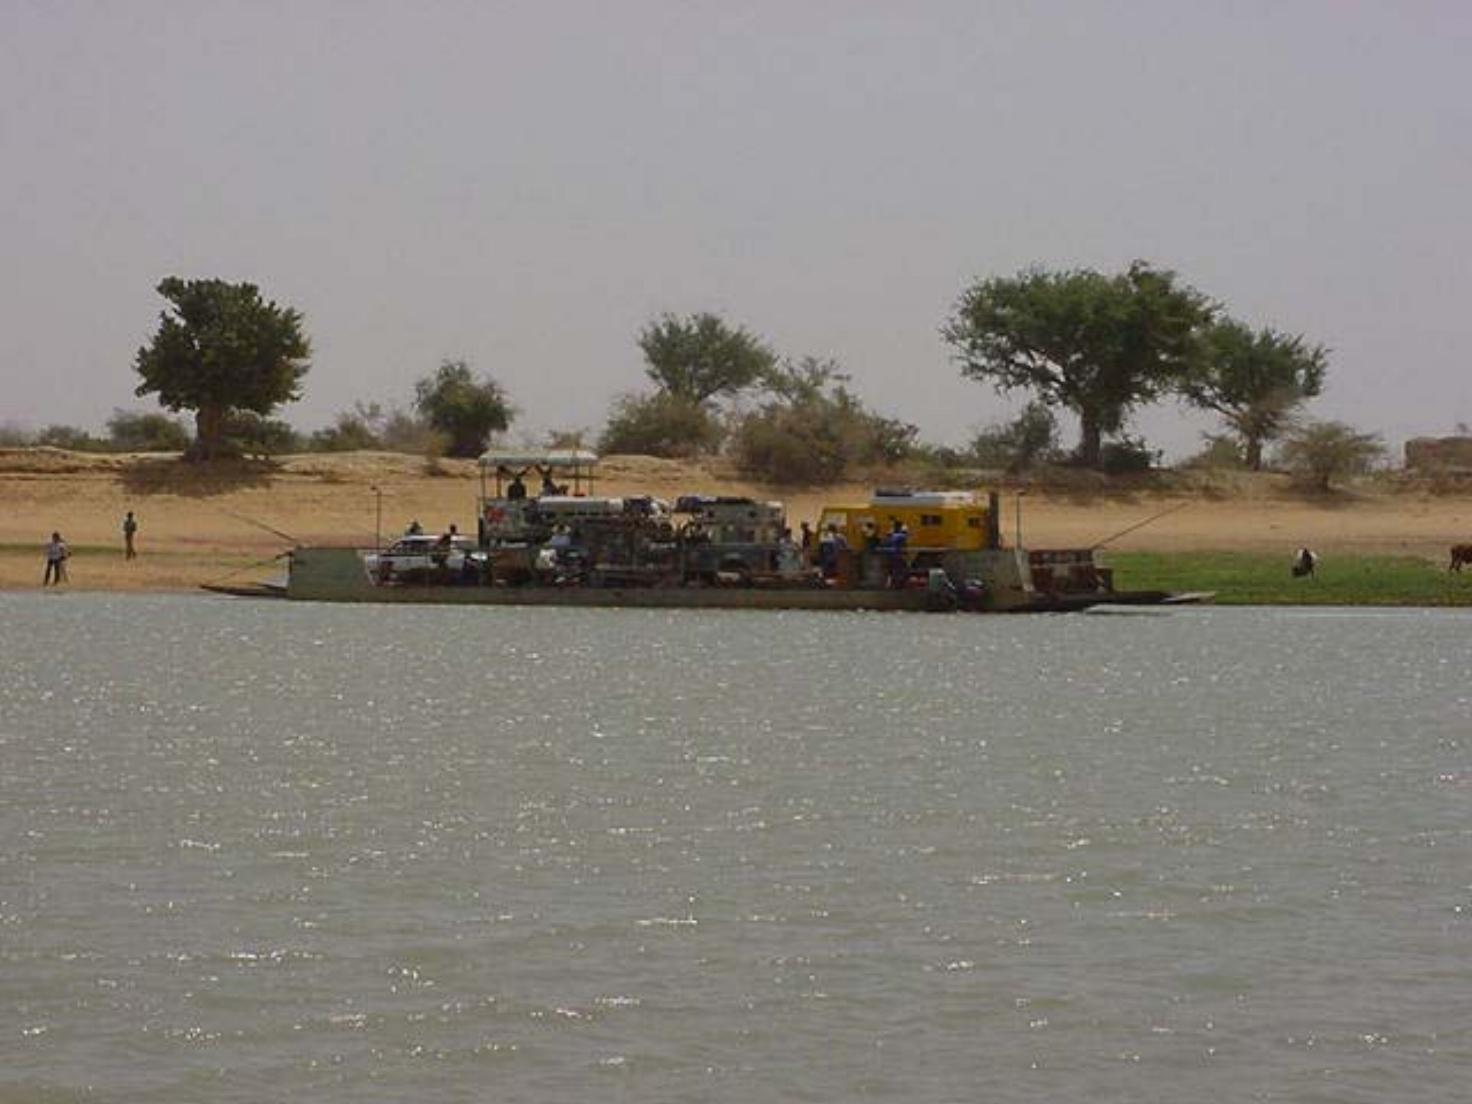 Crossing the Bani River